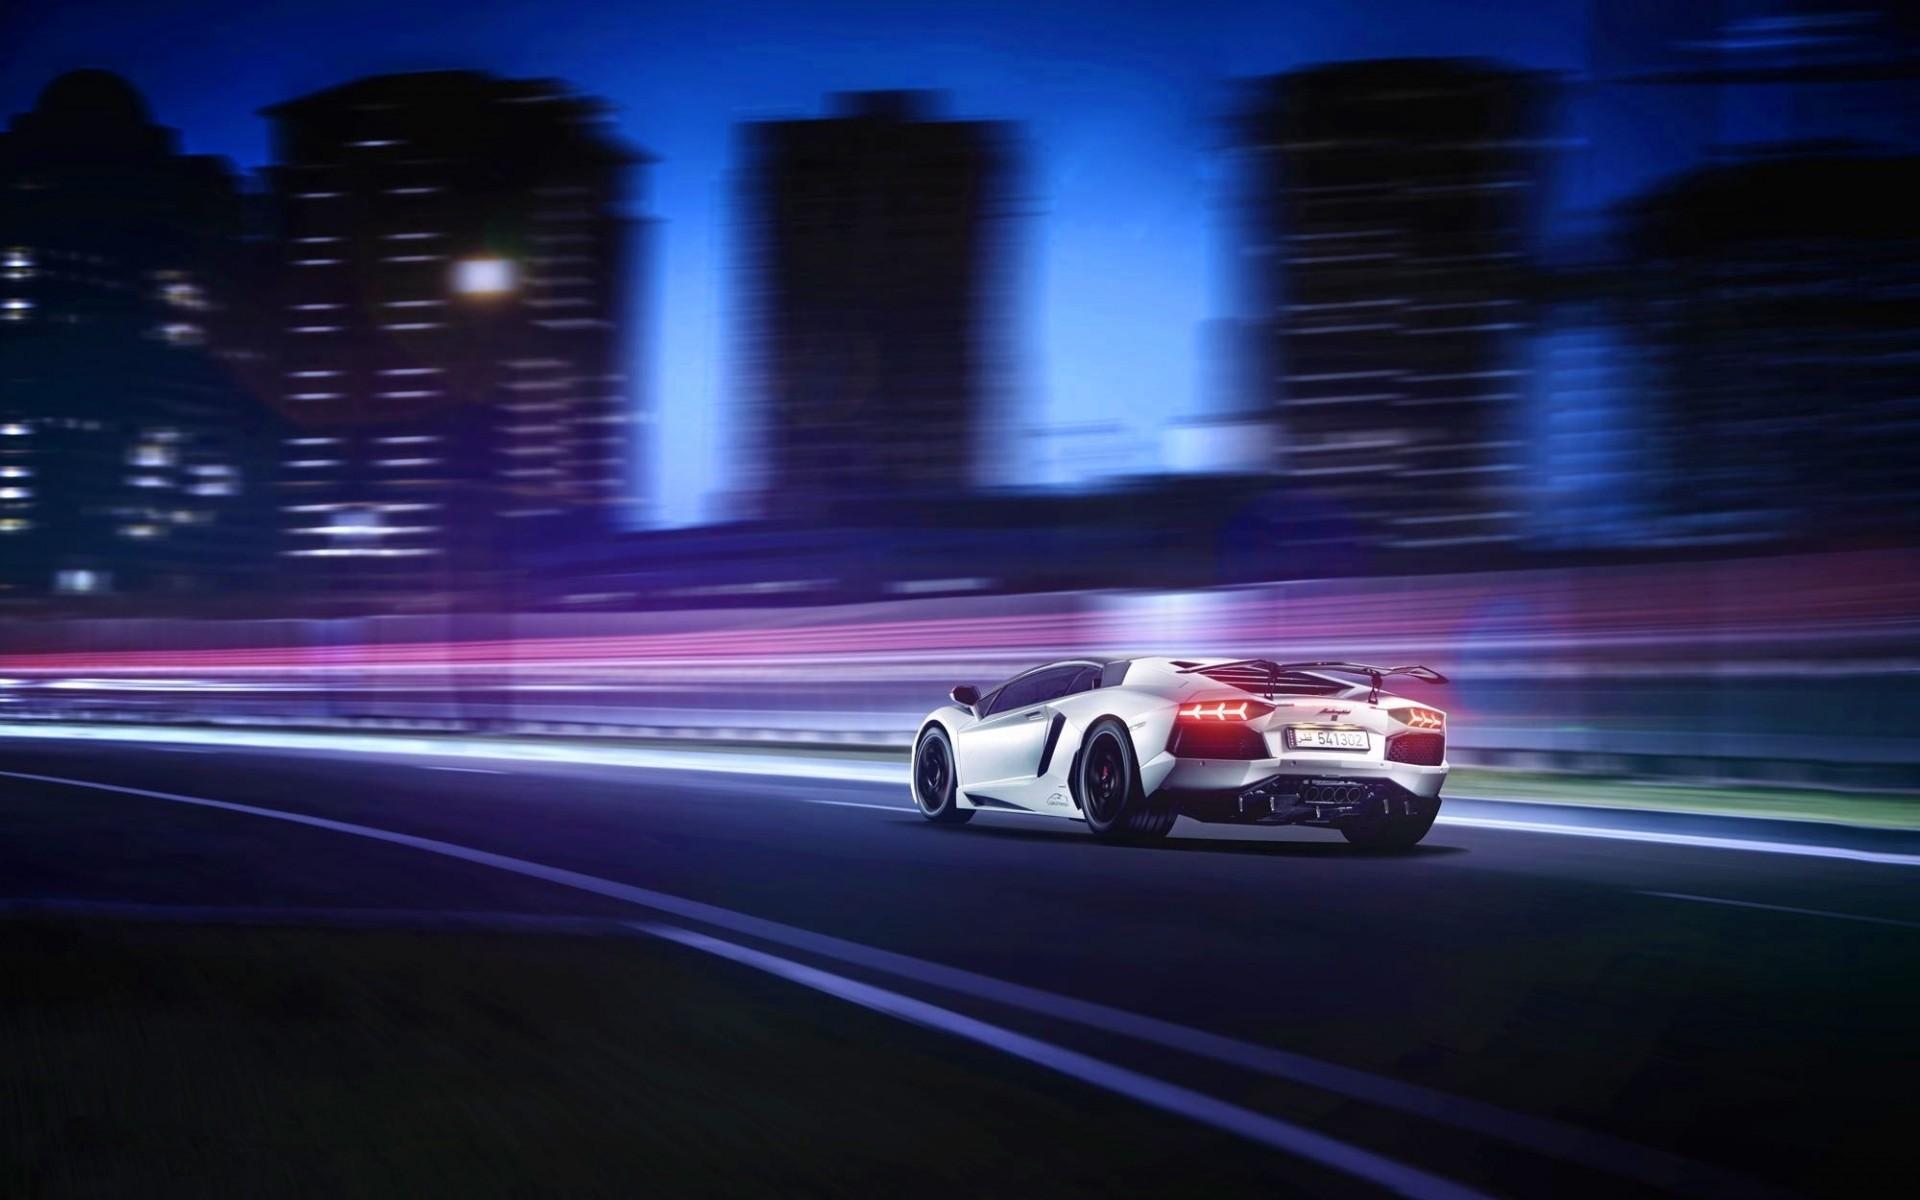 Vaporwave Iphone Wallpaper Lamborghini Aventador Motion Blur Hd Cars 4k Wallpapers